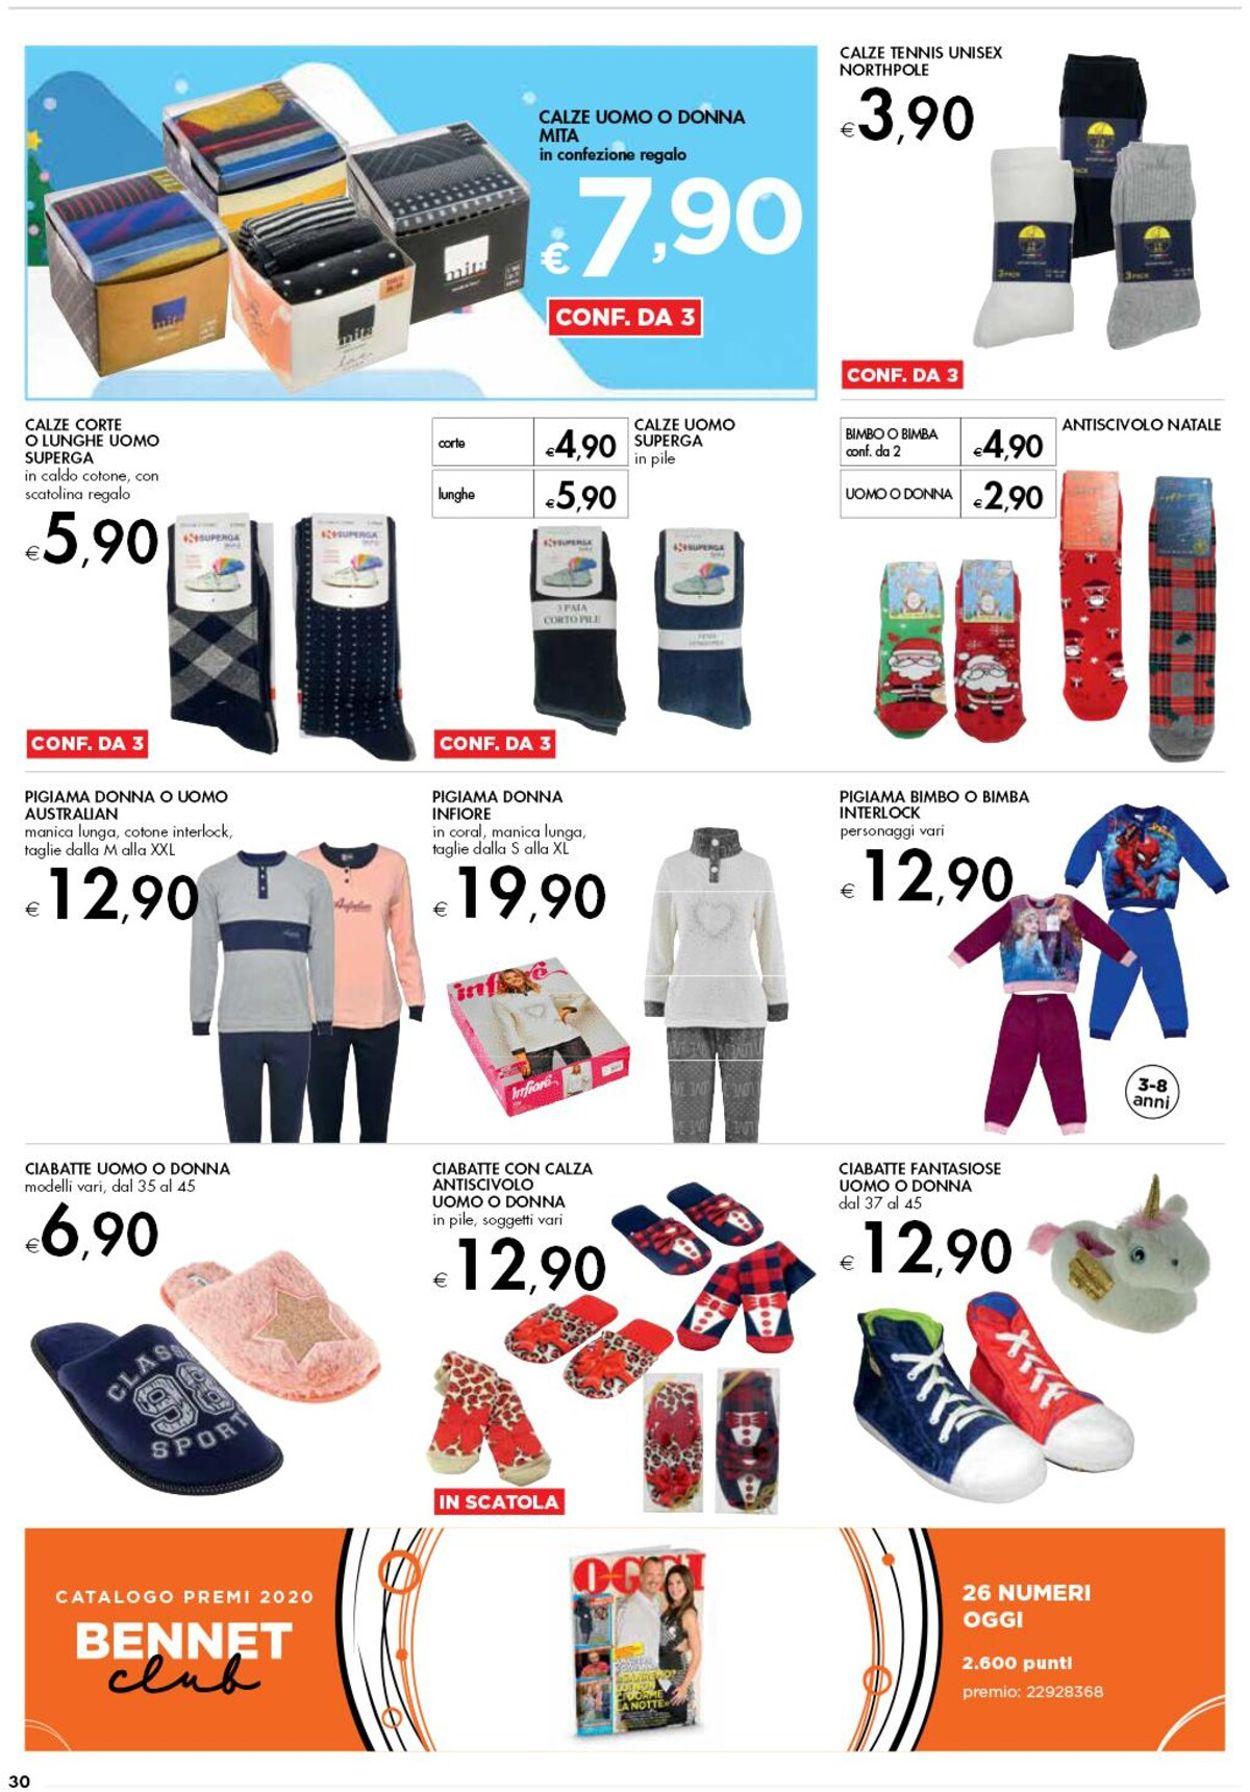 Volantino bennet - Natale 2020 - Offerte 03/12-16/12/2020 (Pagina 30)